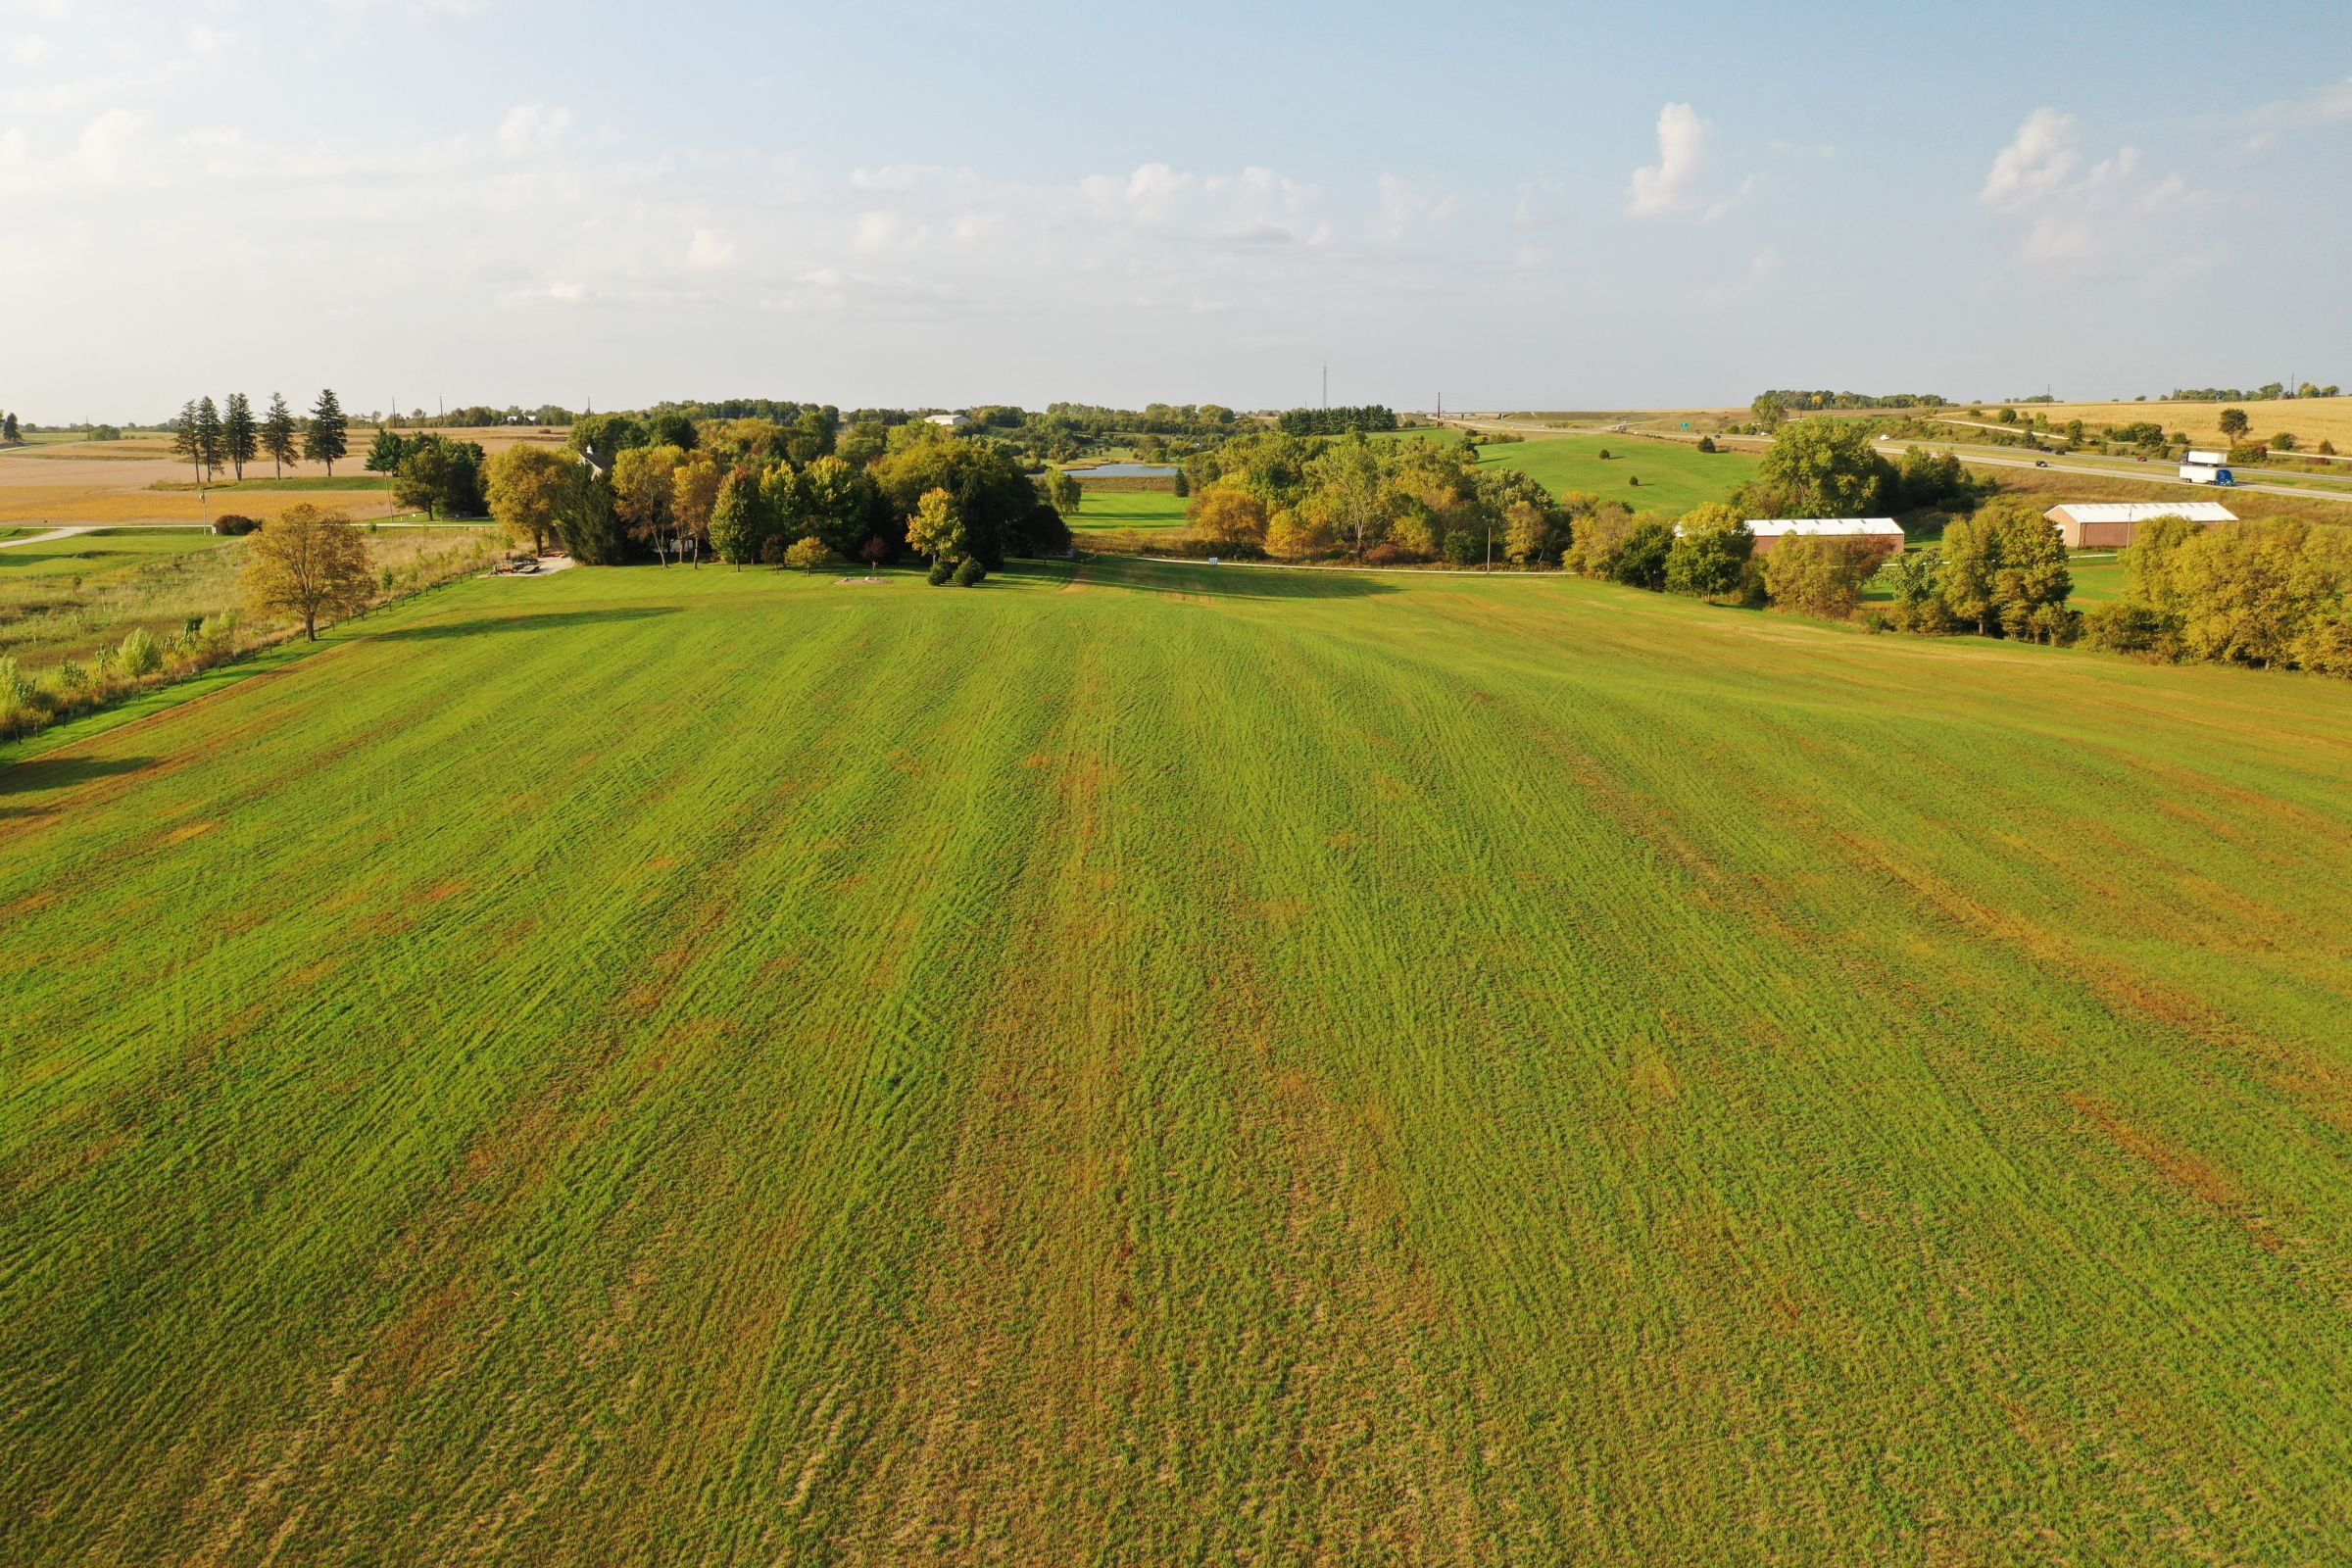 land-warren-county-iowa-29-acres-listing-number-14919-0-2020-10-12-170348.jpg